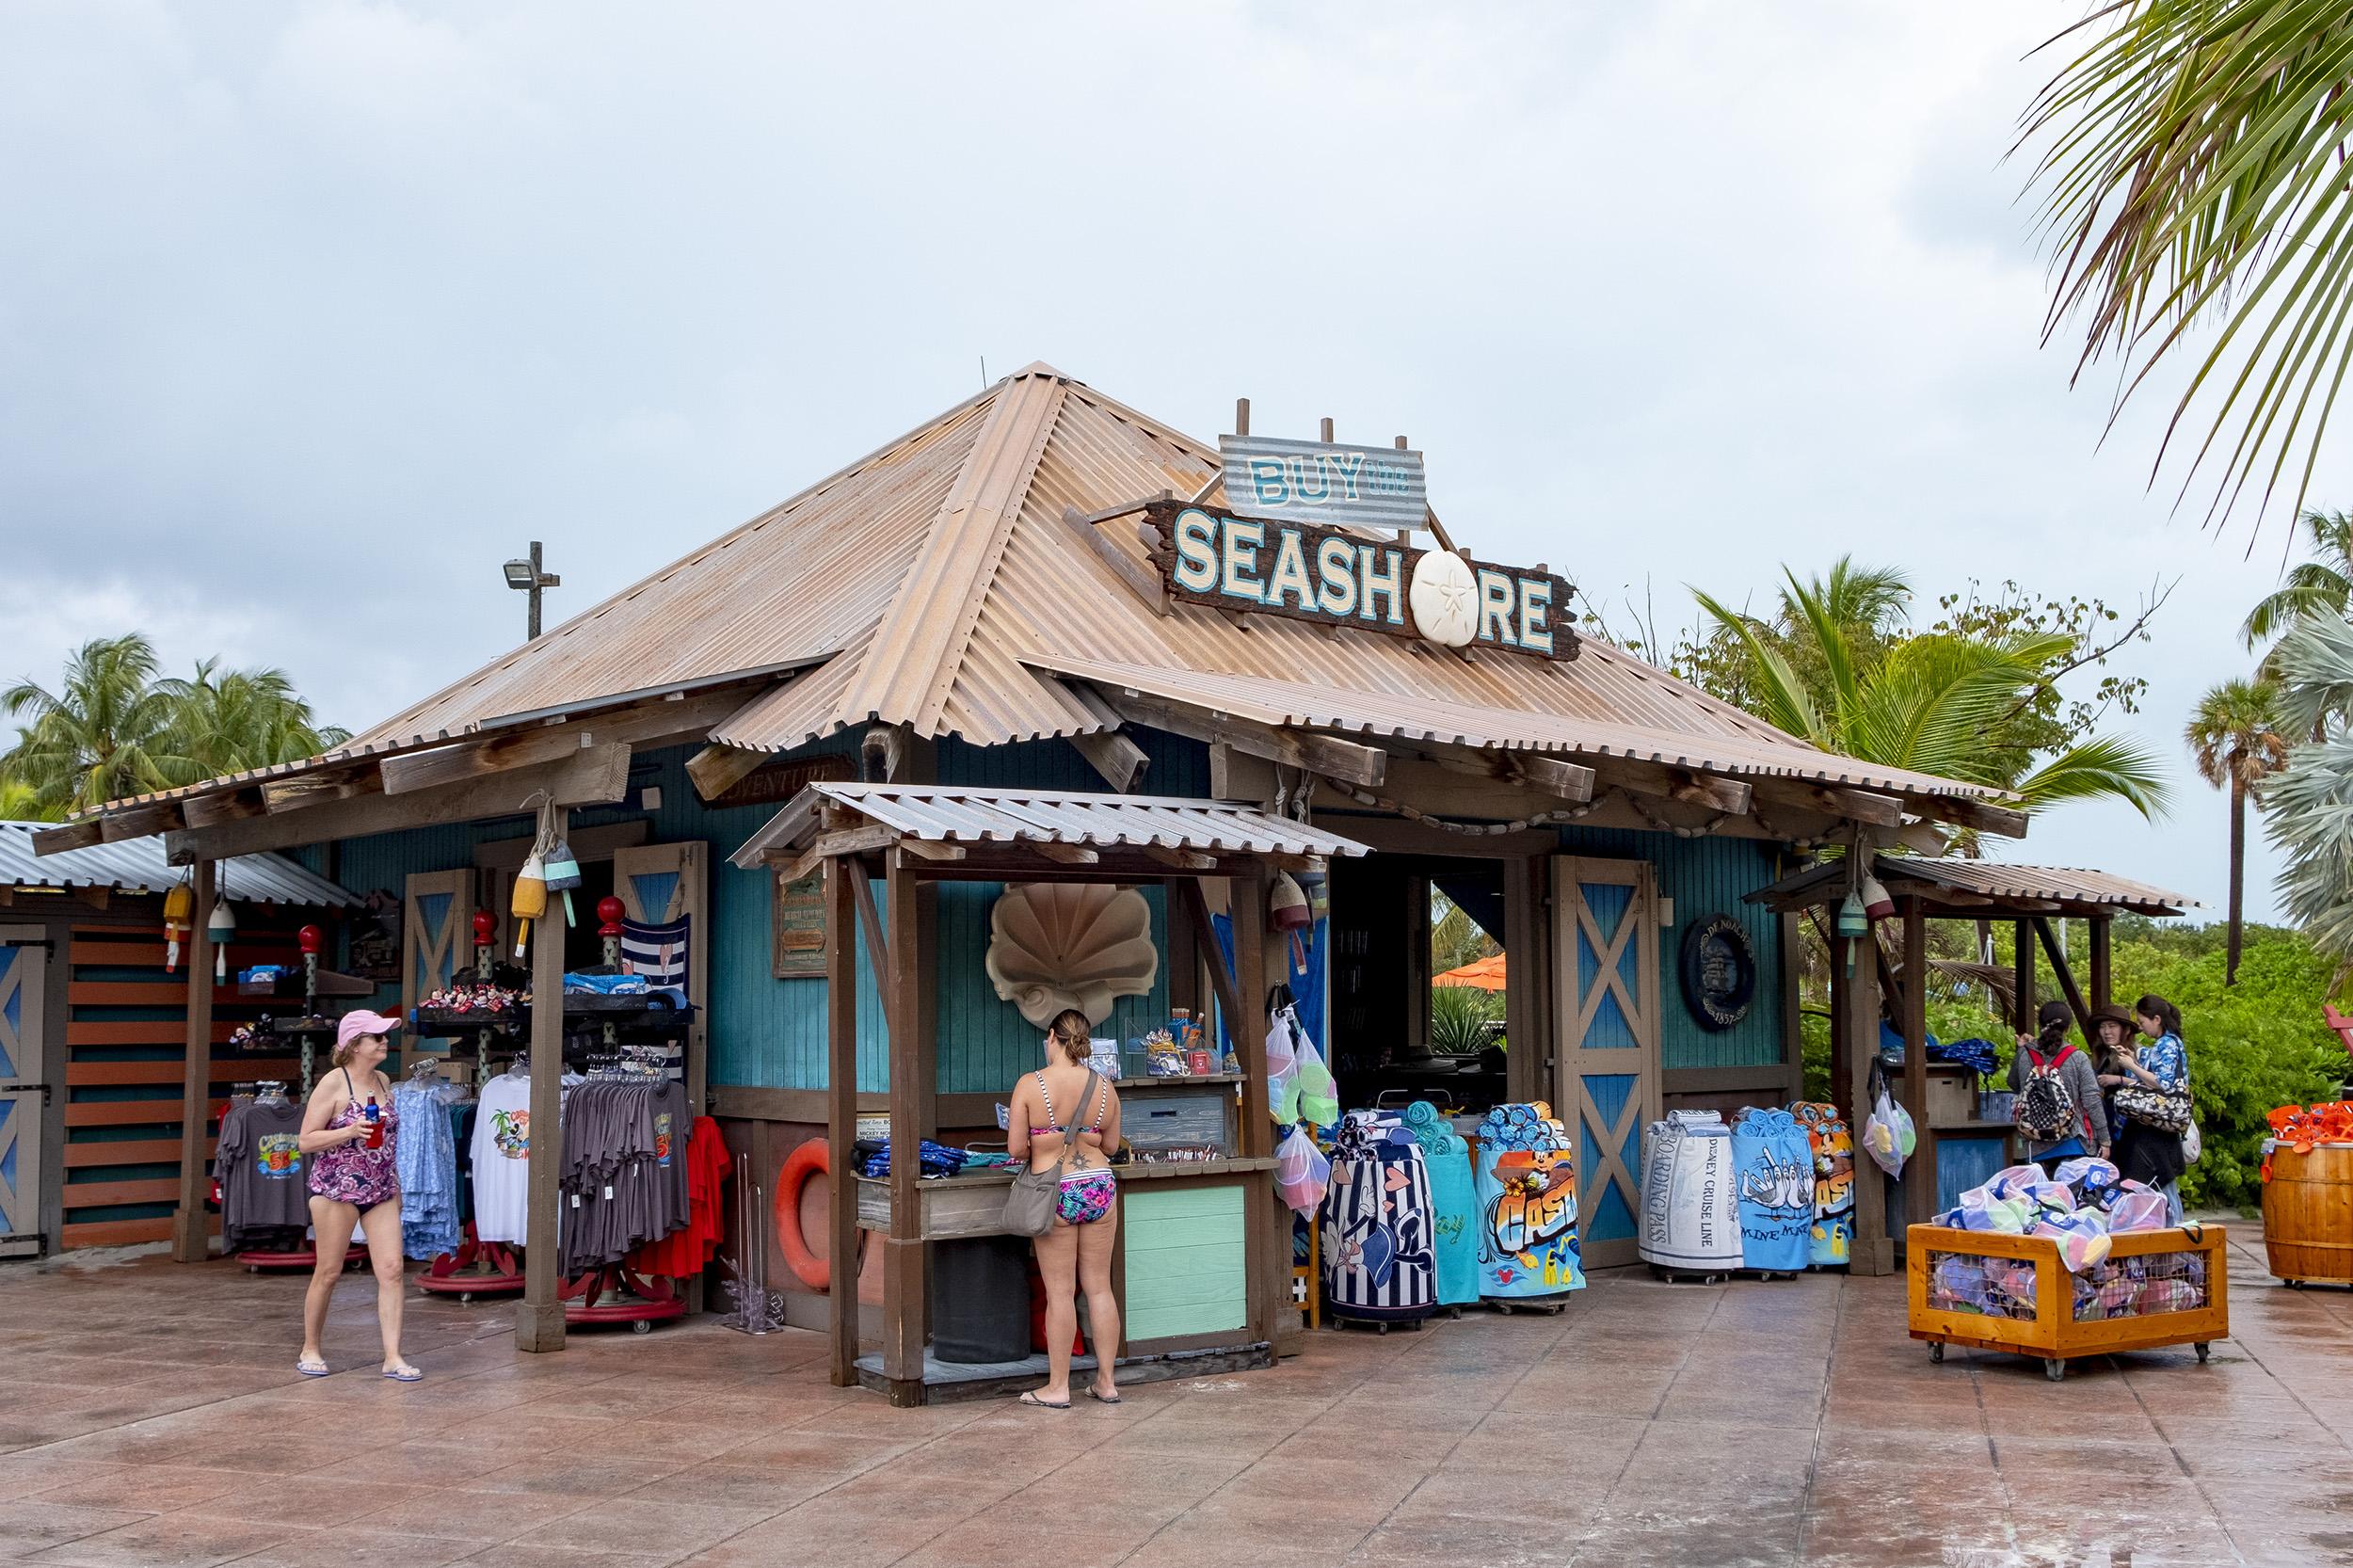 Castaway Cay Buy the Seashore